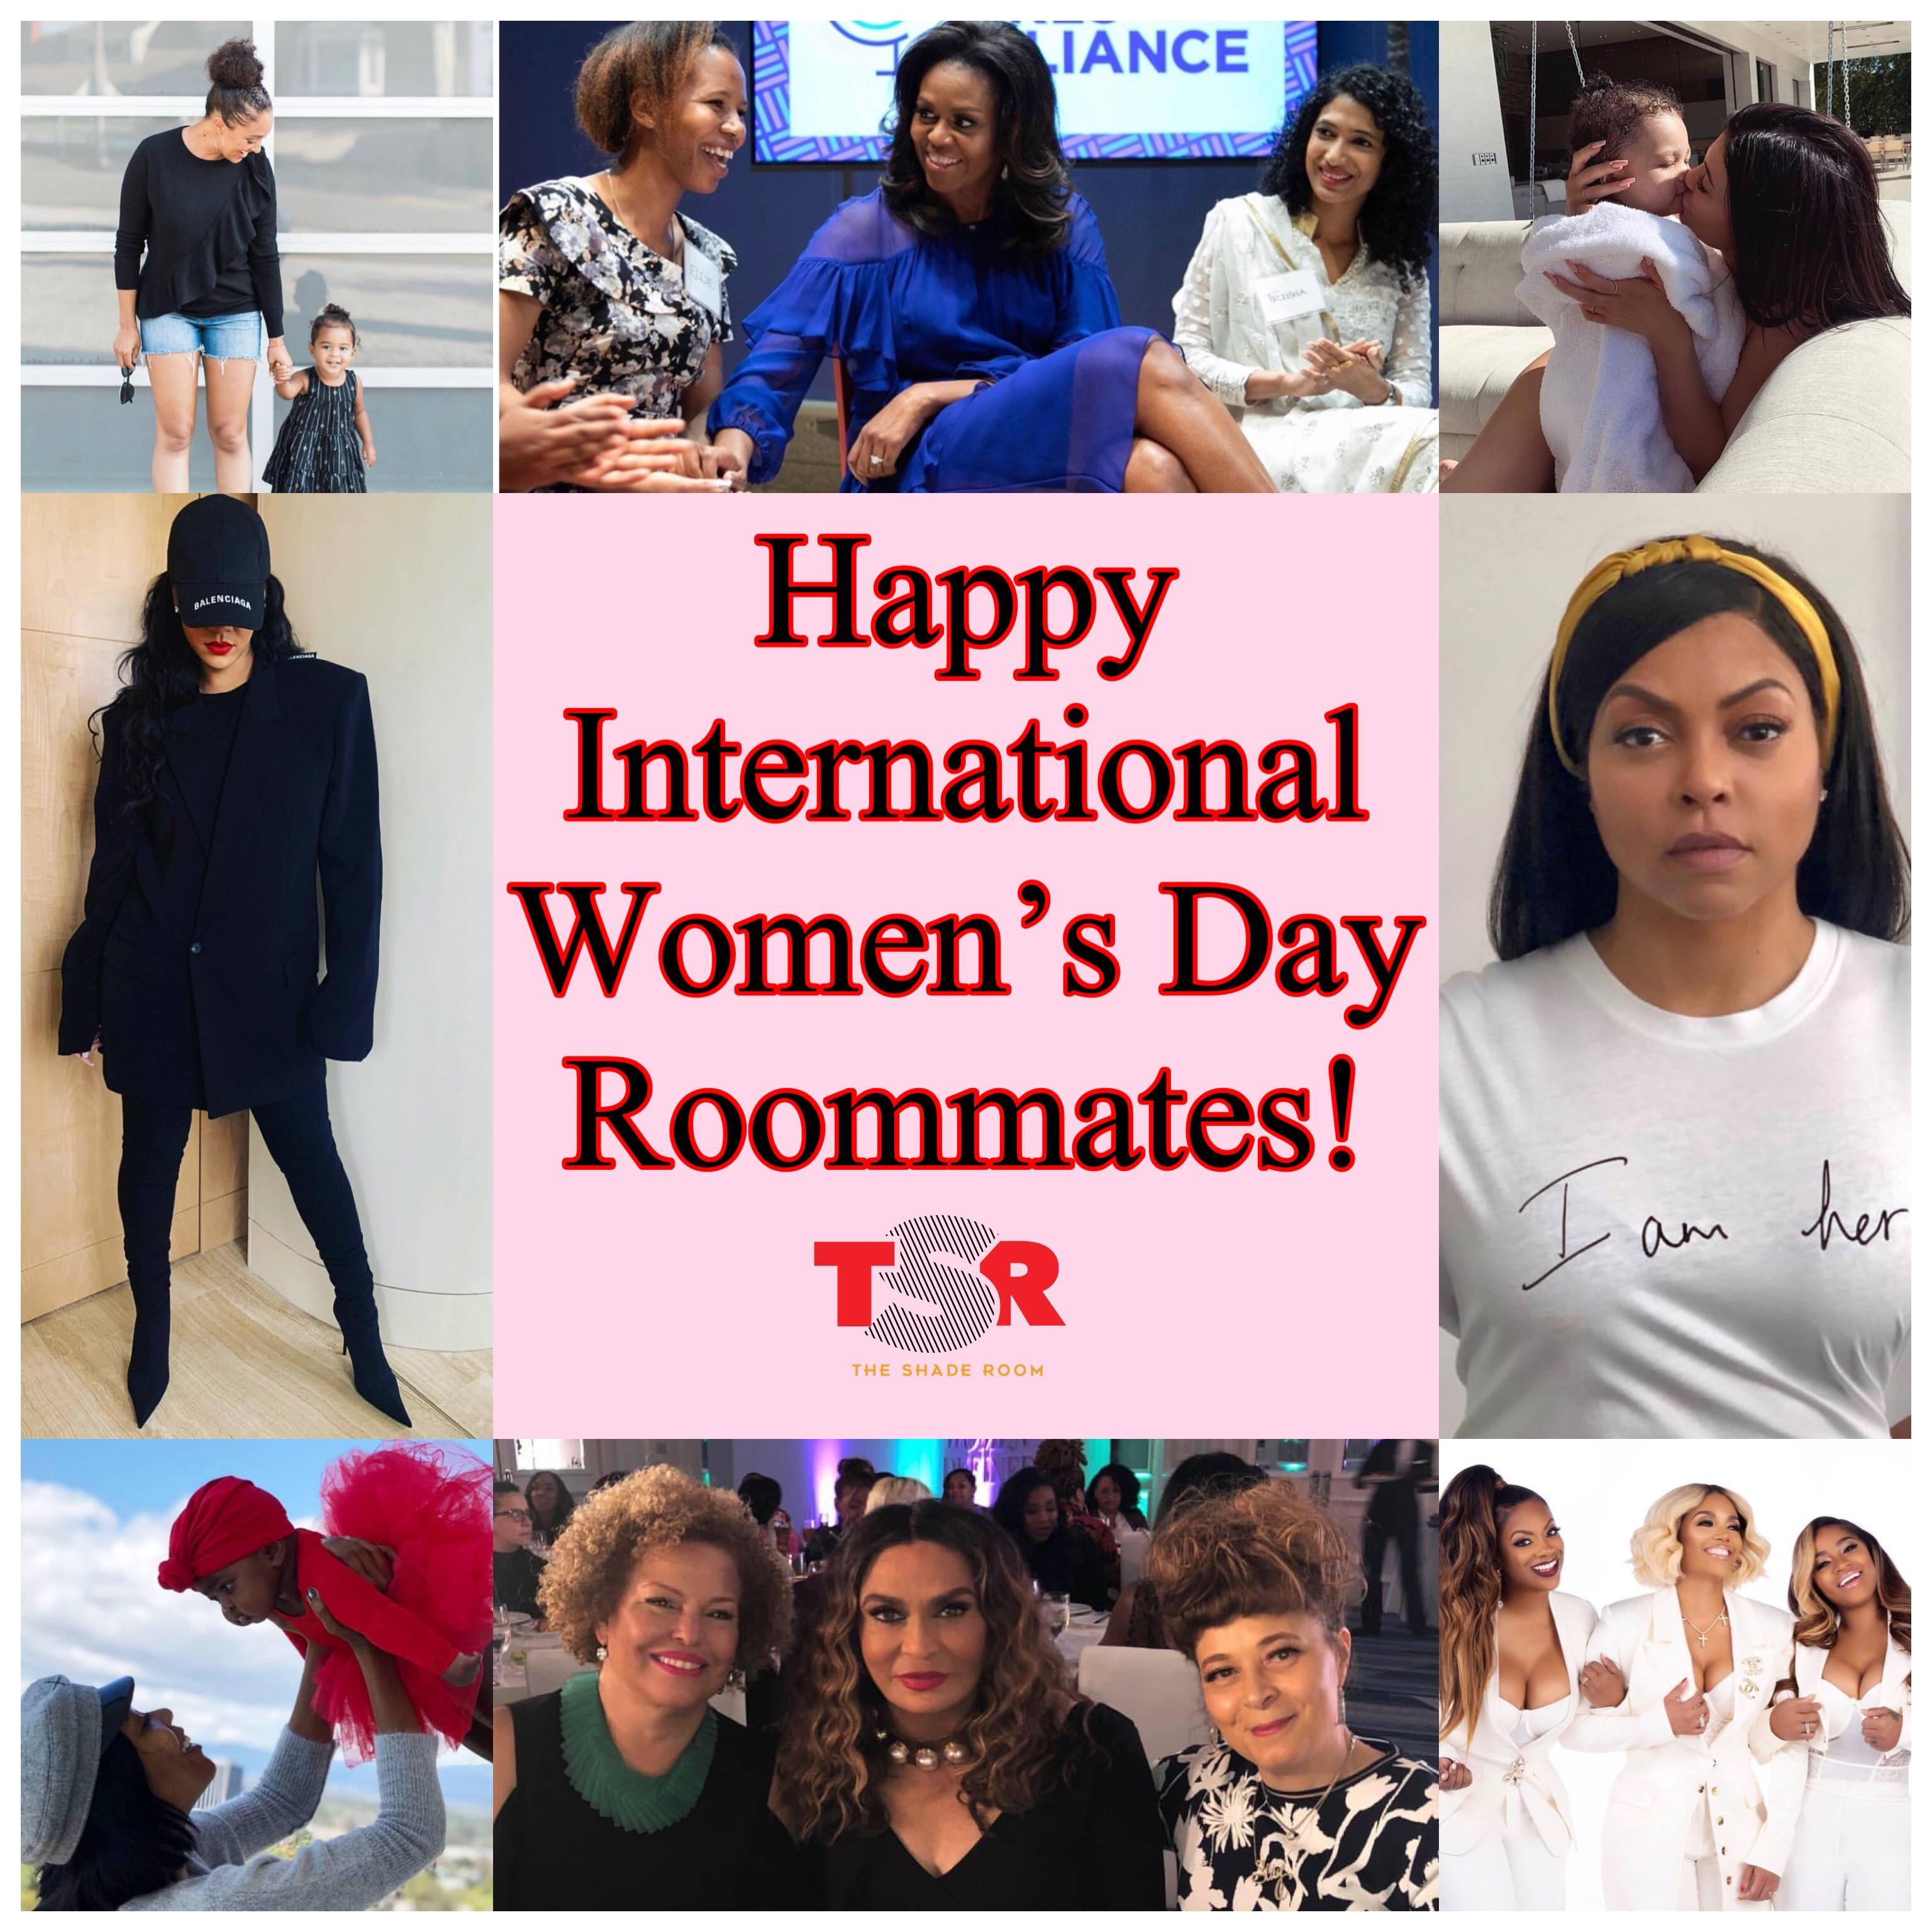 Happy International Women's Day Roommates